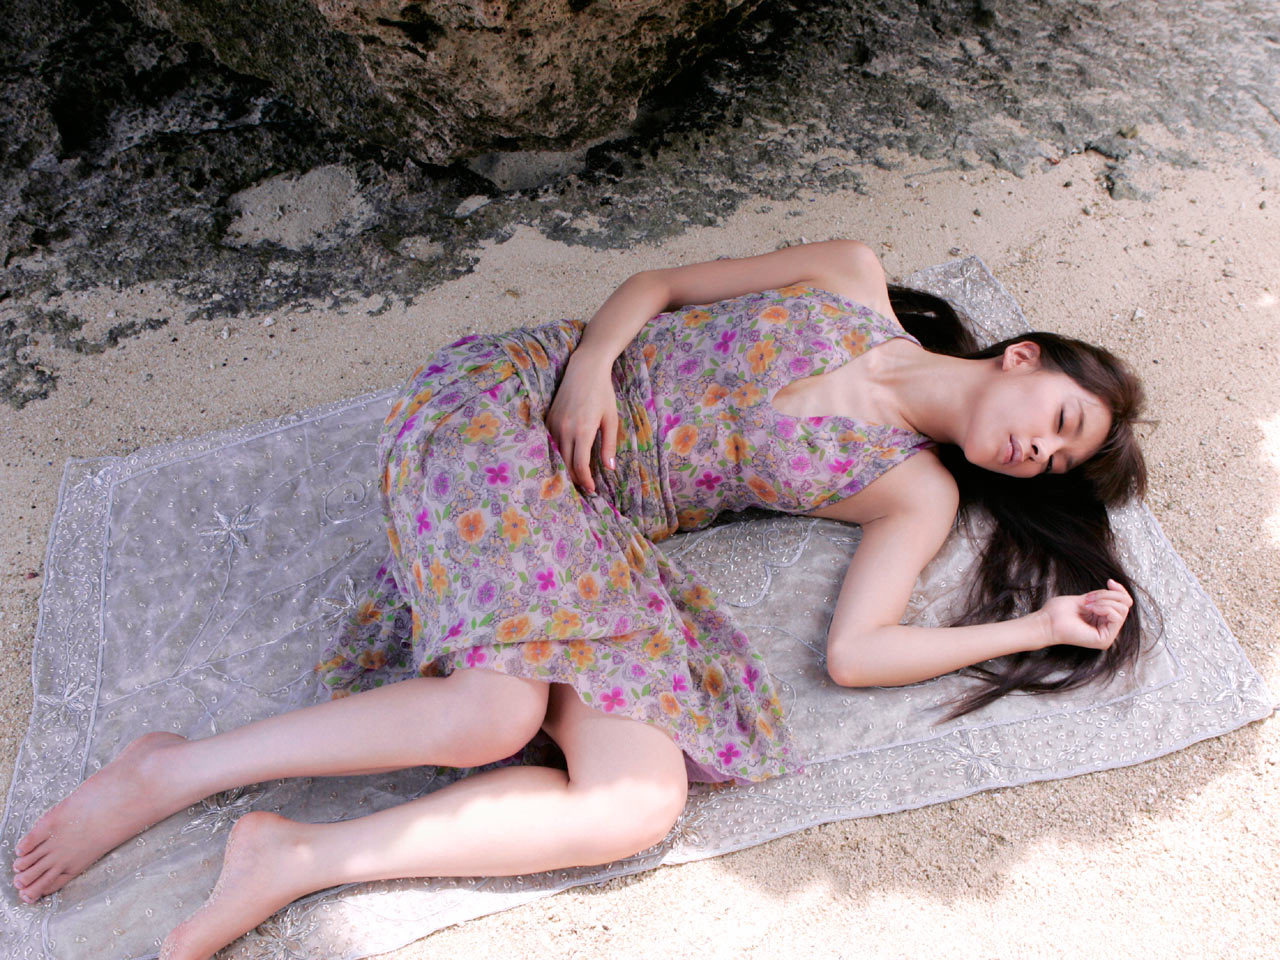 http://blog.cnobi.jp/v1/blog/user/a8c5c06266ed65ea9b67299e90592fa7/1347766402